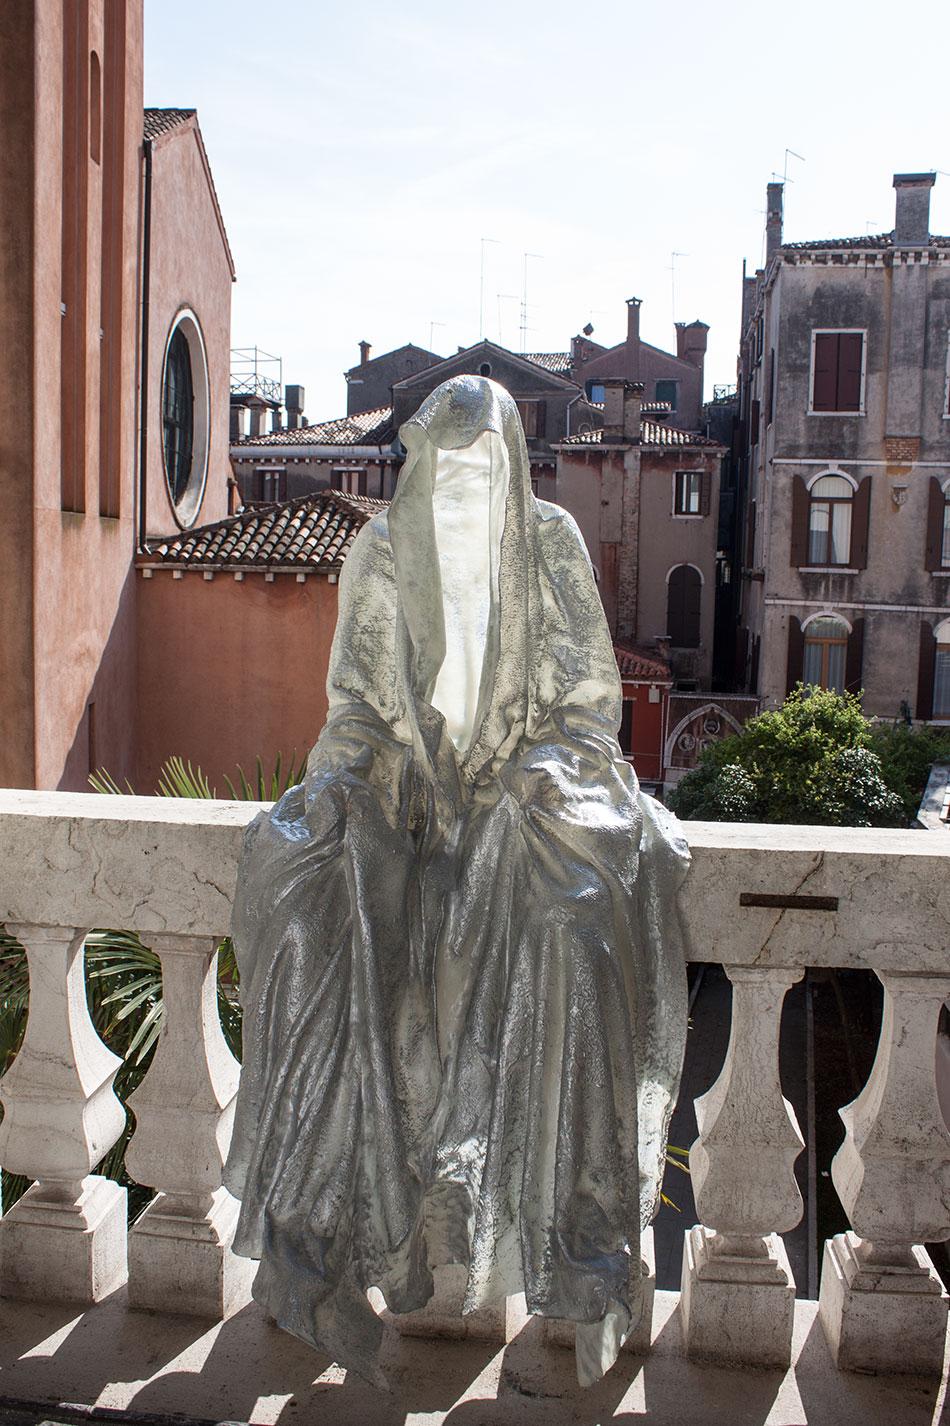 La biennale venezia transport to palazzo mora show time for Artisti biennale venezia